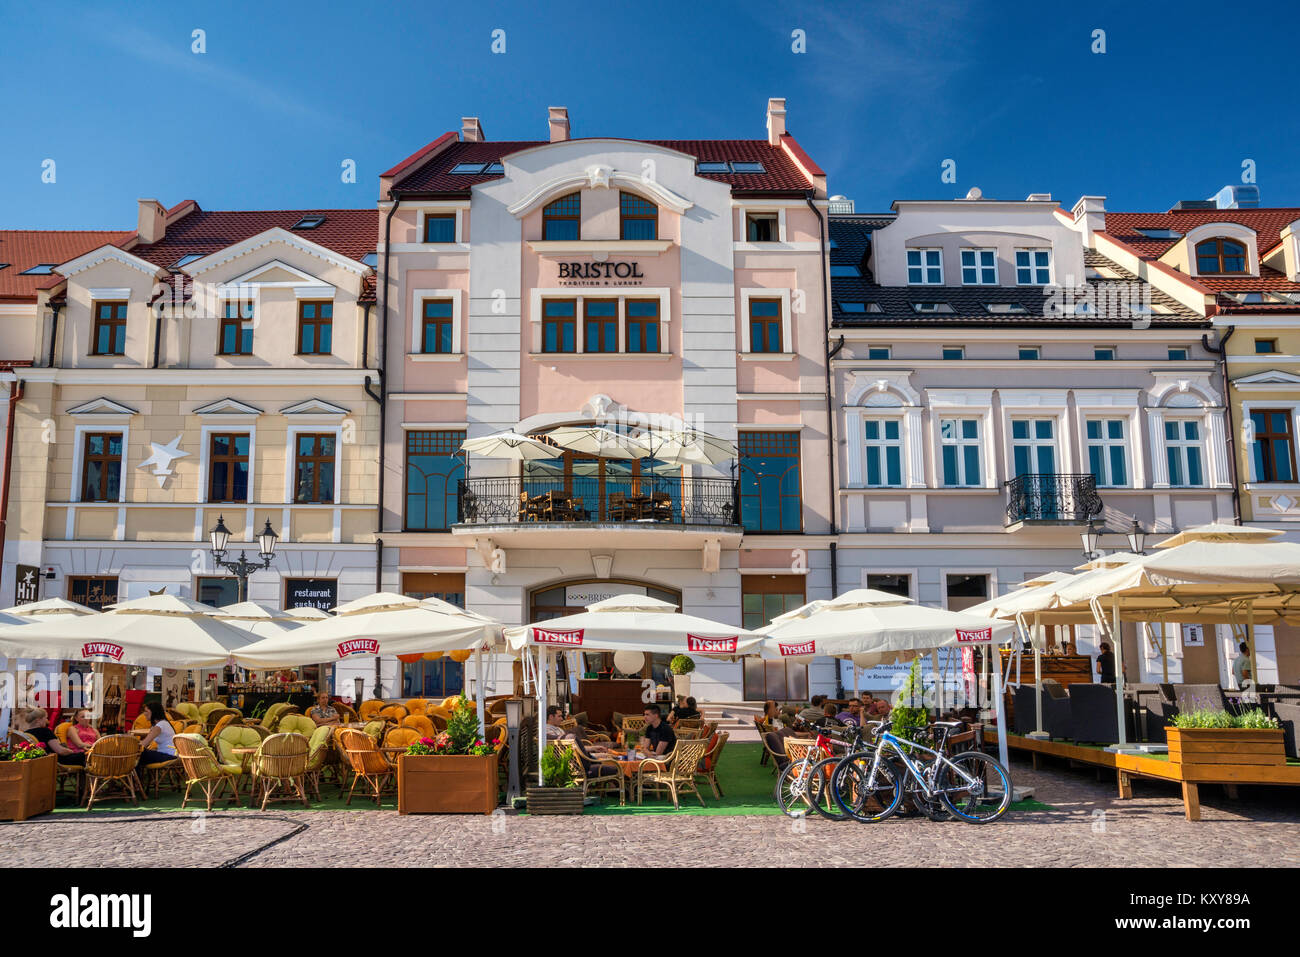 Hotel Bristol, sidewalk cafes at Rynek or Market Square in Rzeszow, Malopolska aka Lesser Poland region, Poland - Stock Image